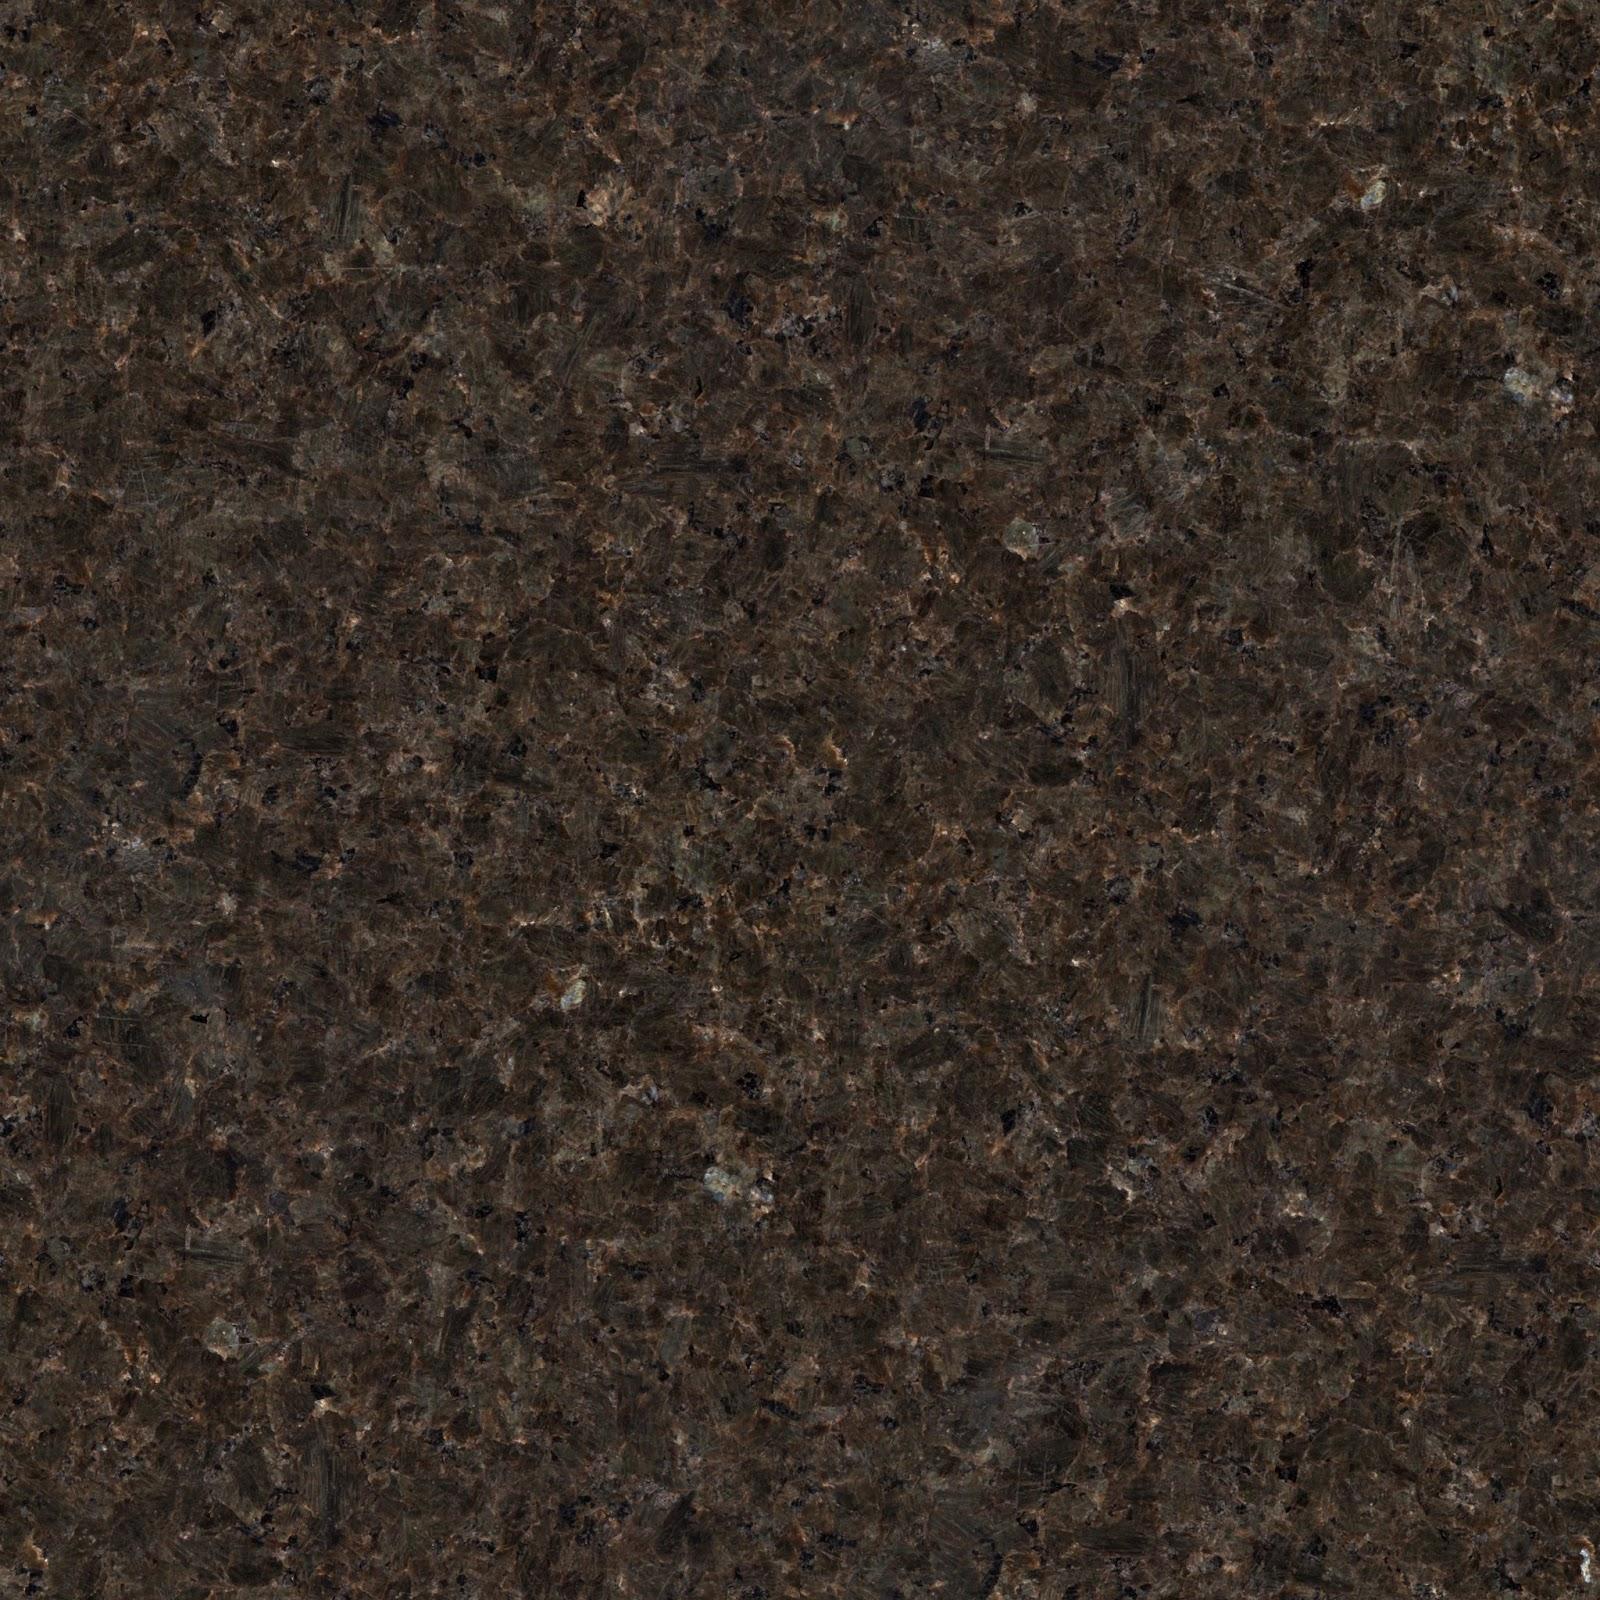 Dark Marble Texture Seamless